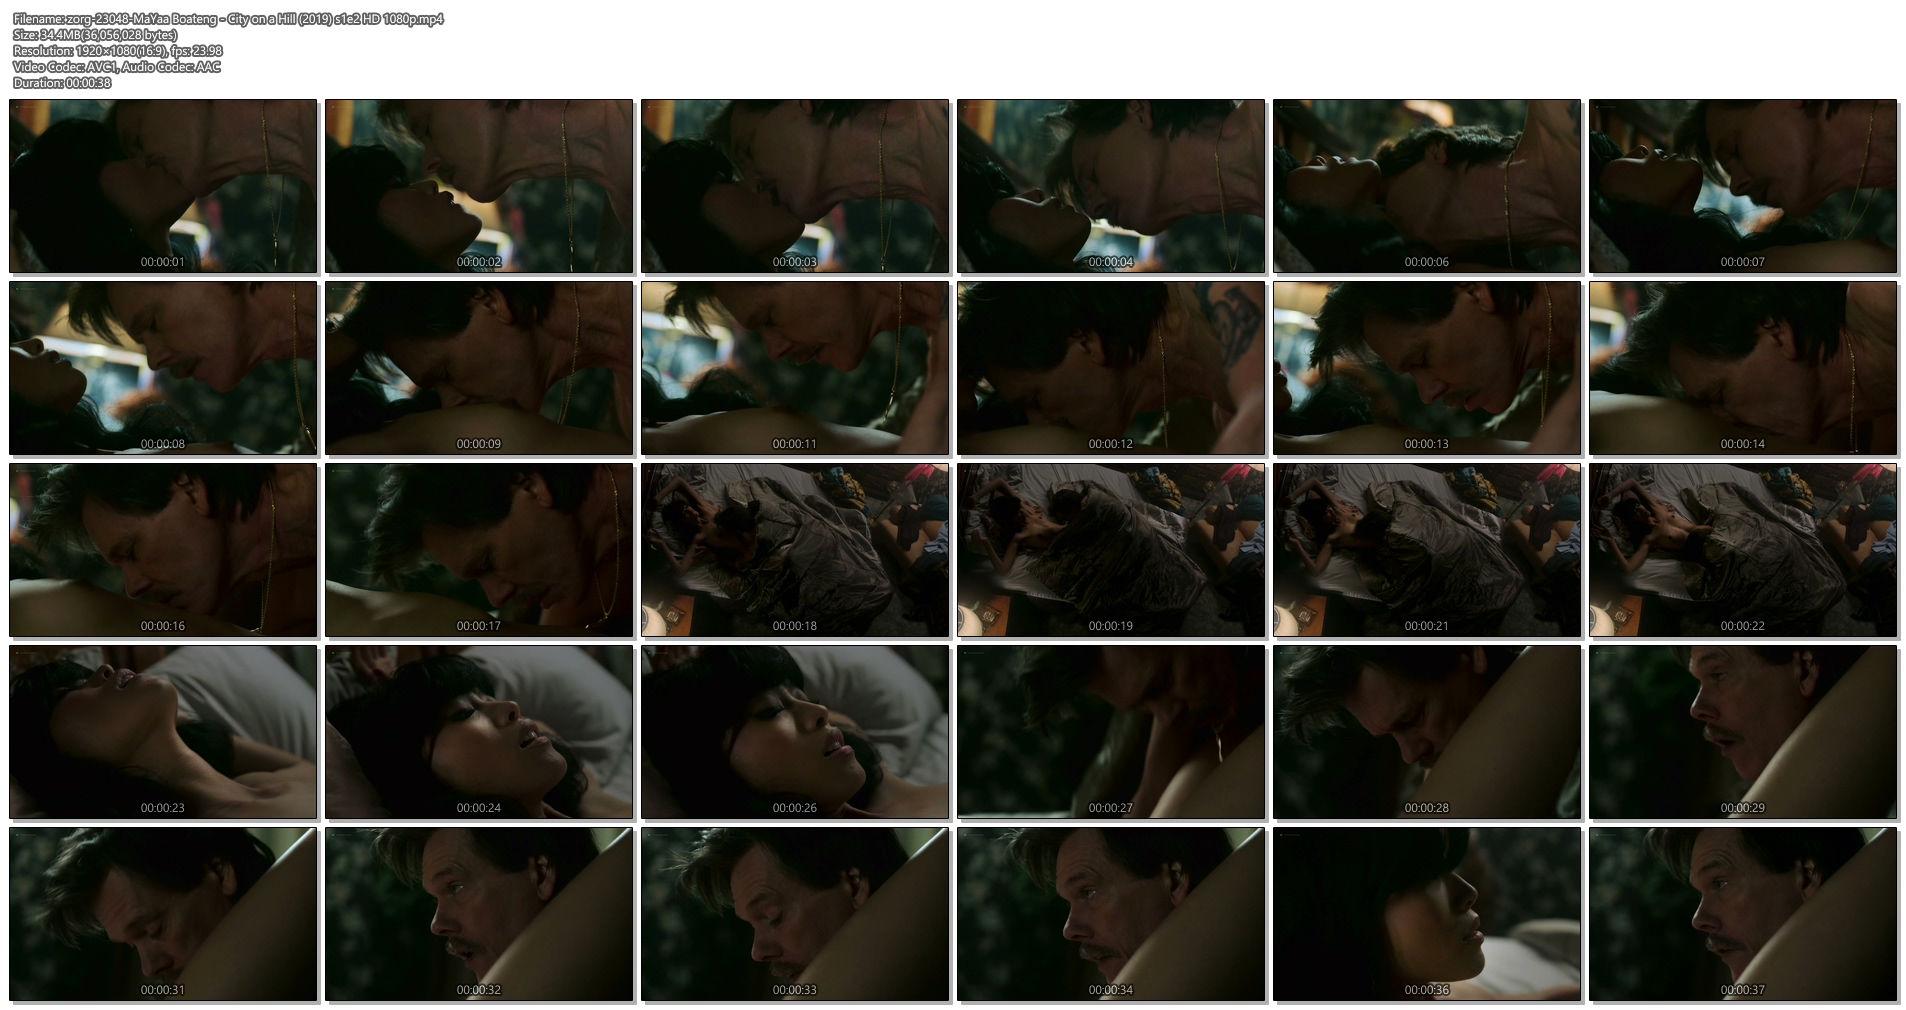 MaYaa Boateng nude topless in sex scene - City on a Hill (2019) s1e2 HD 1080p (1)